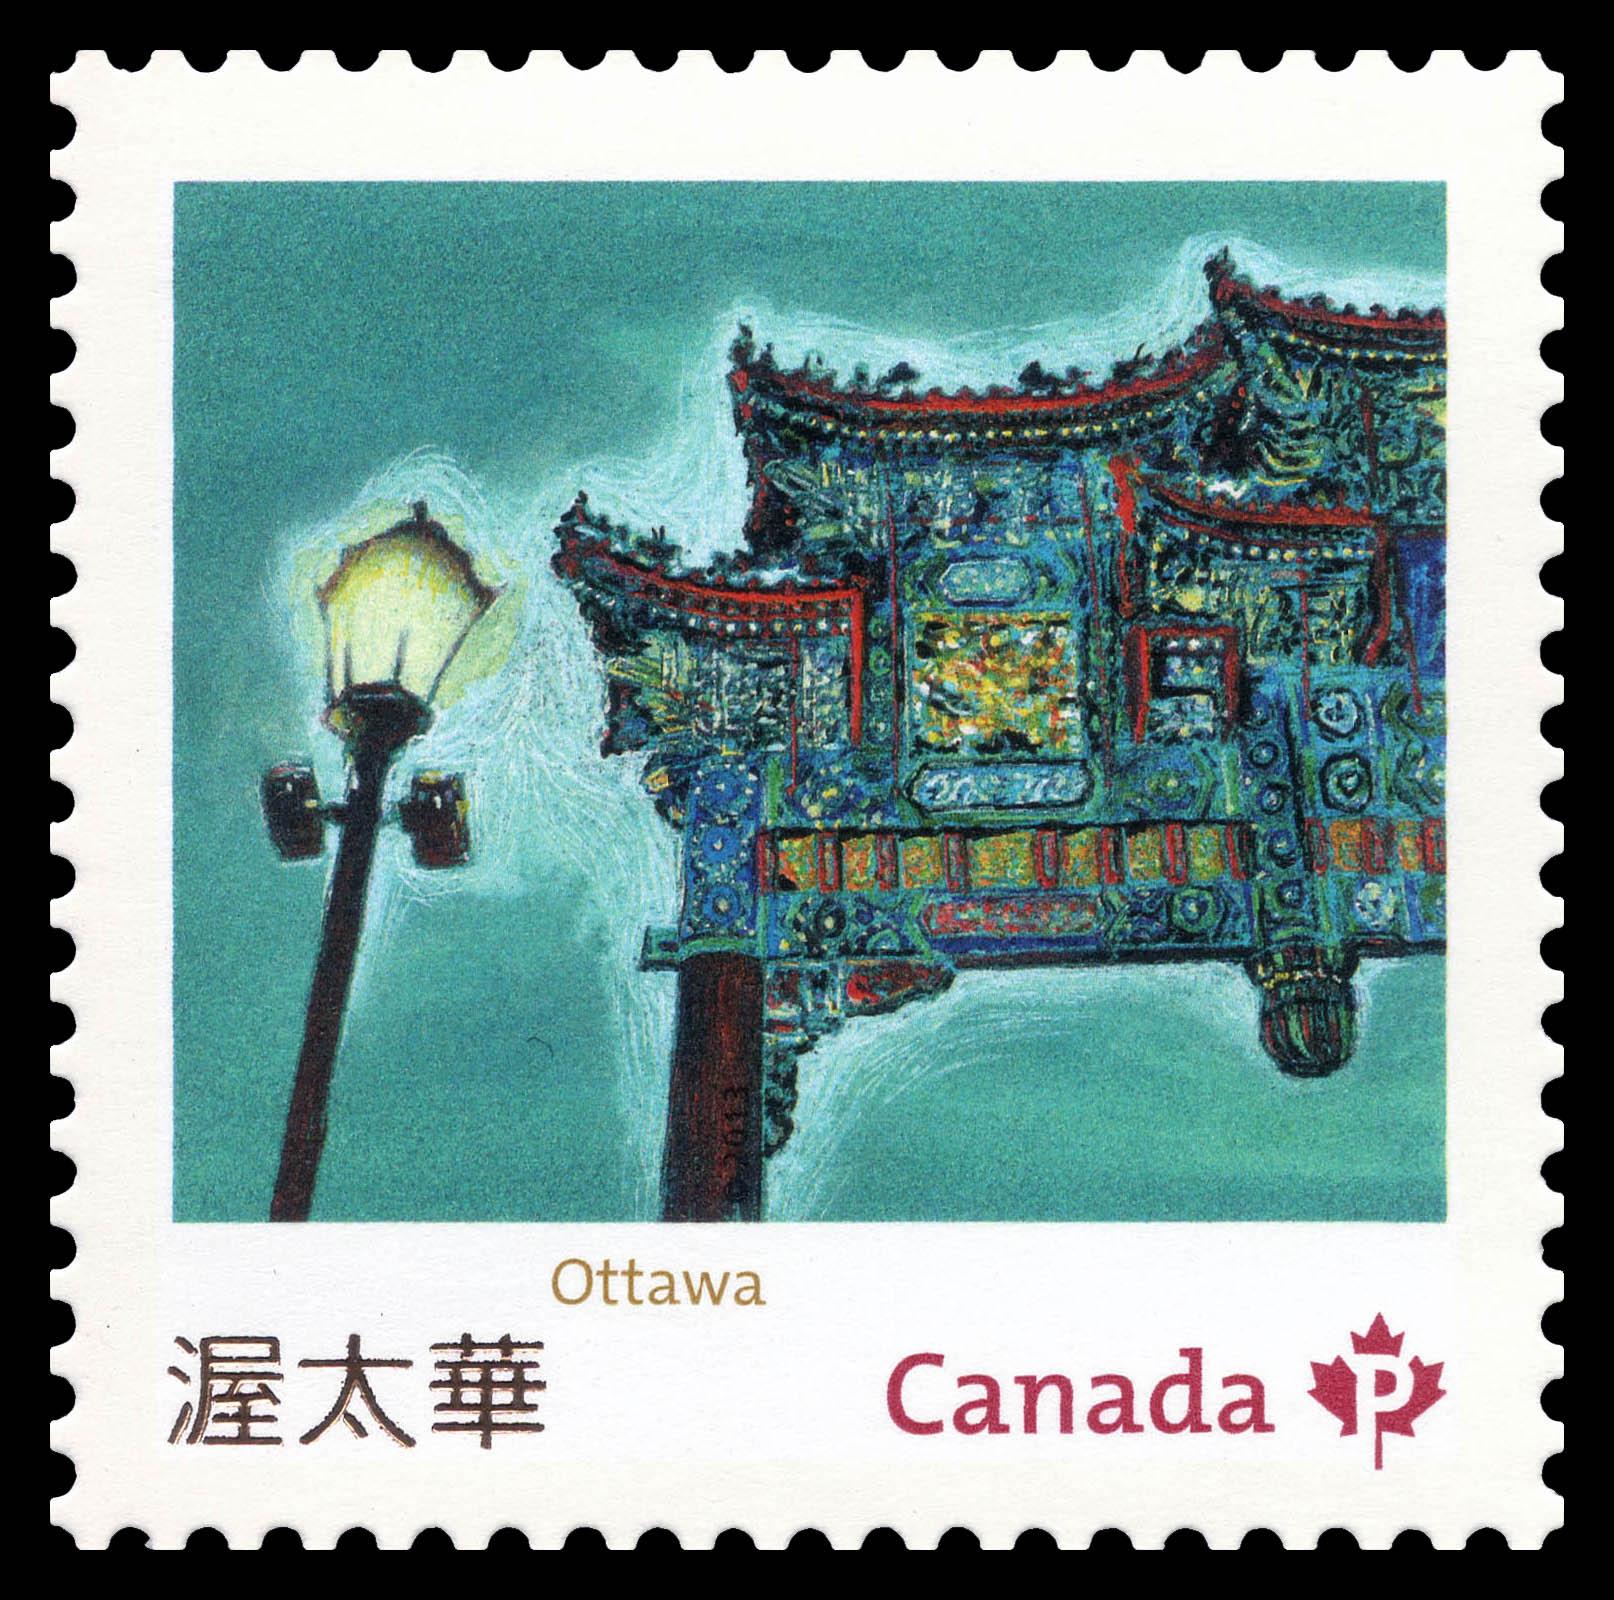 Ottawa Chinatown Gate Canada Postage Stamp